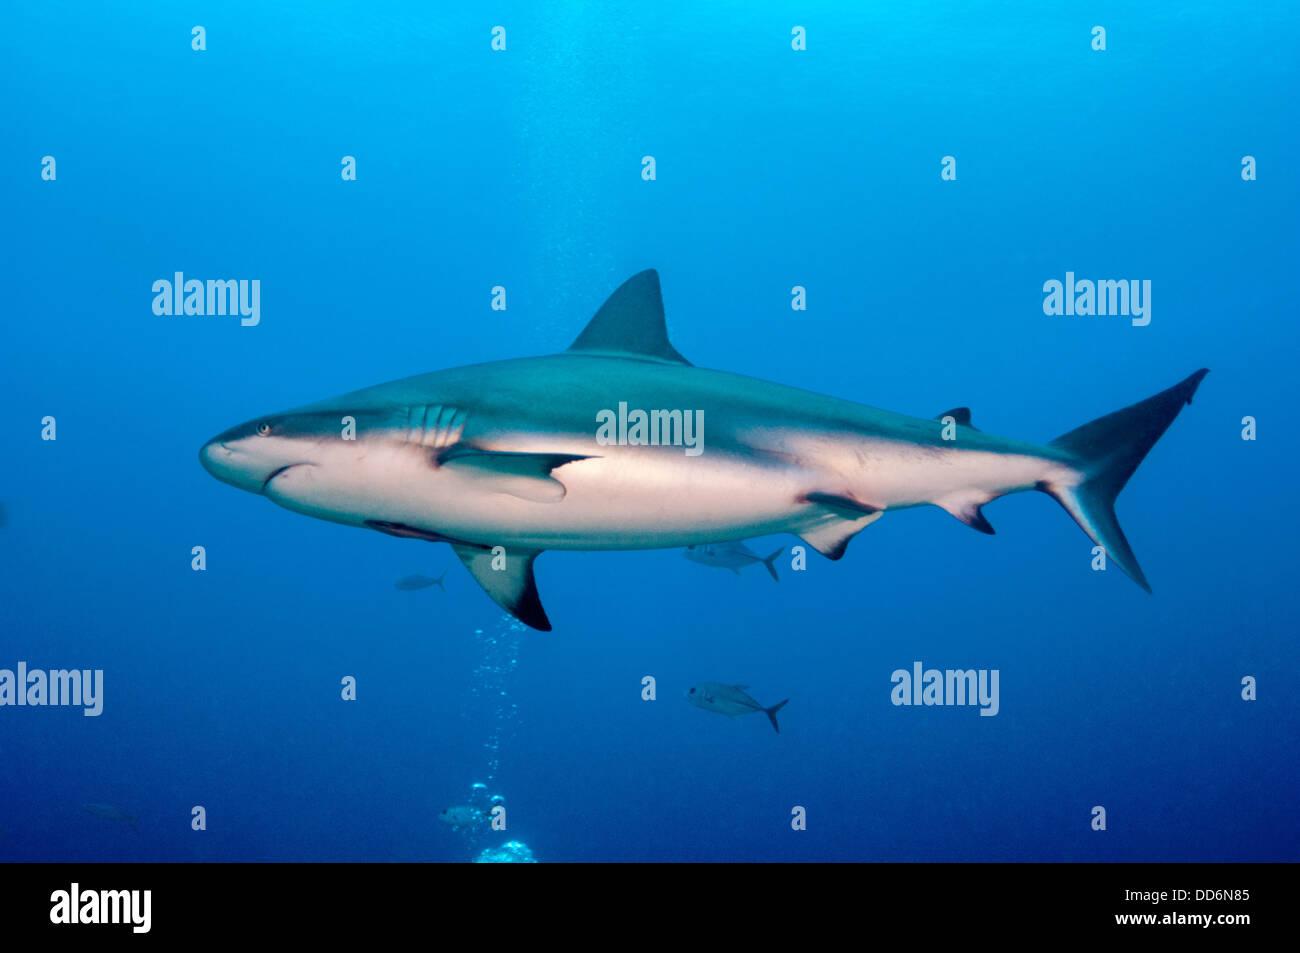 A Reef Shark, Carcharhinus perezii, swims through the water column on a reef near the island of Roatan, Honduras - Stock Image